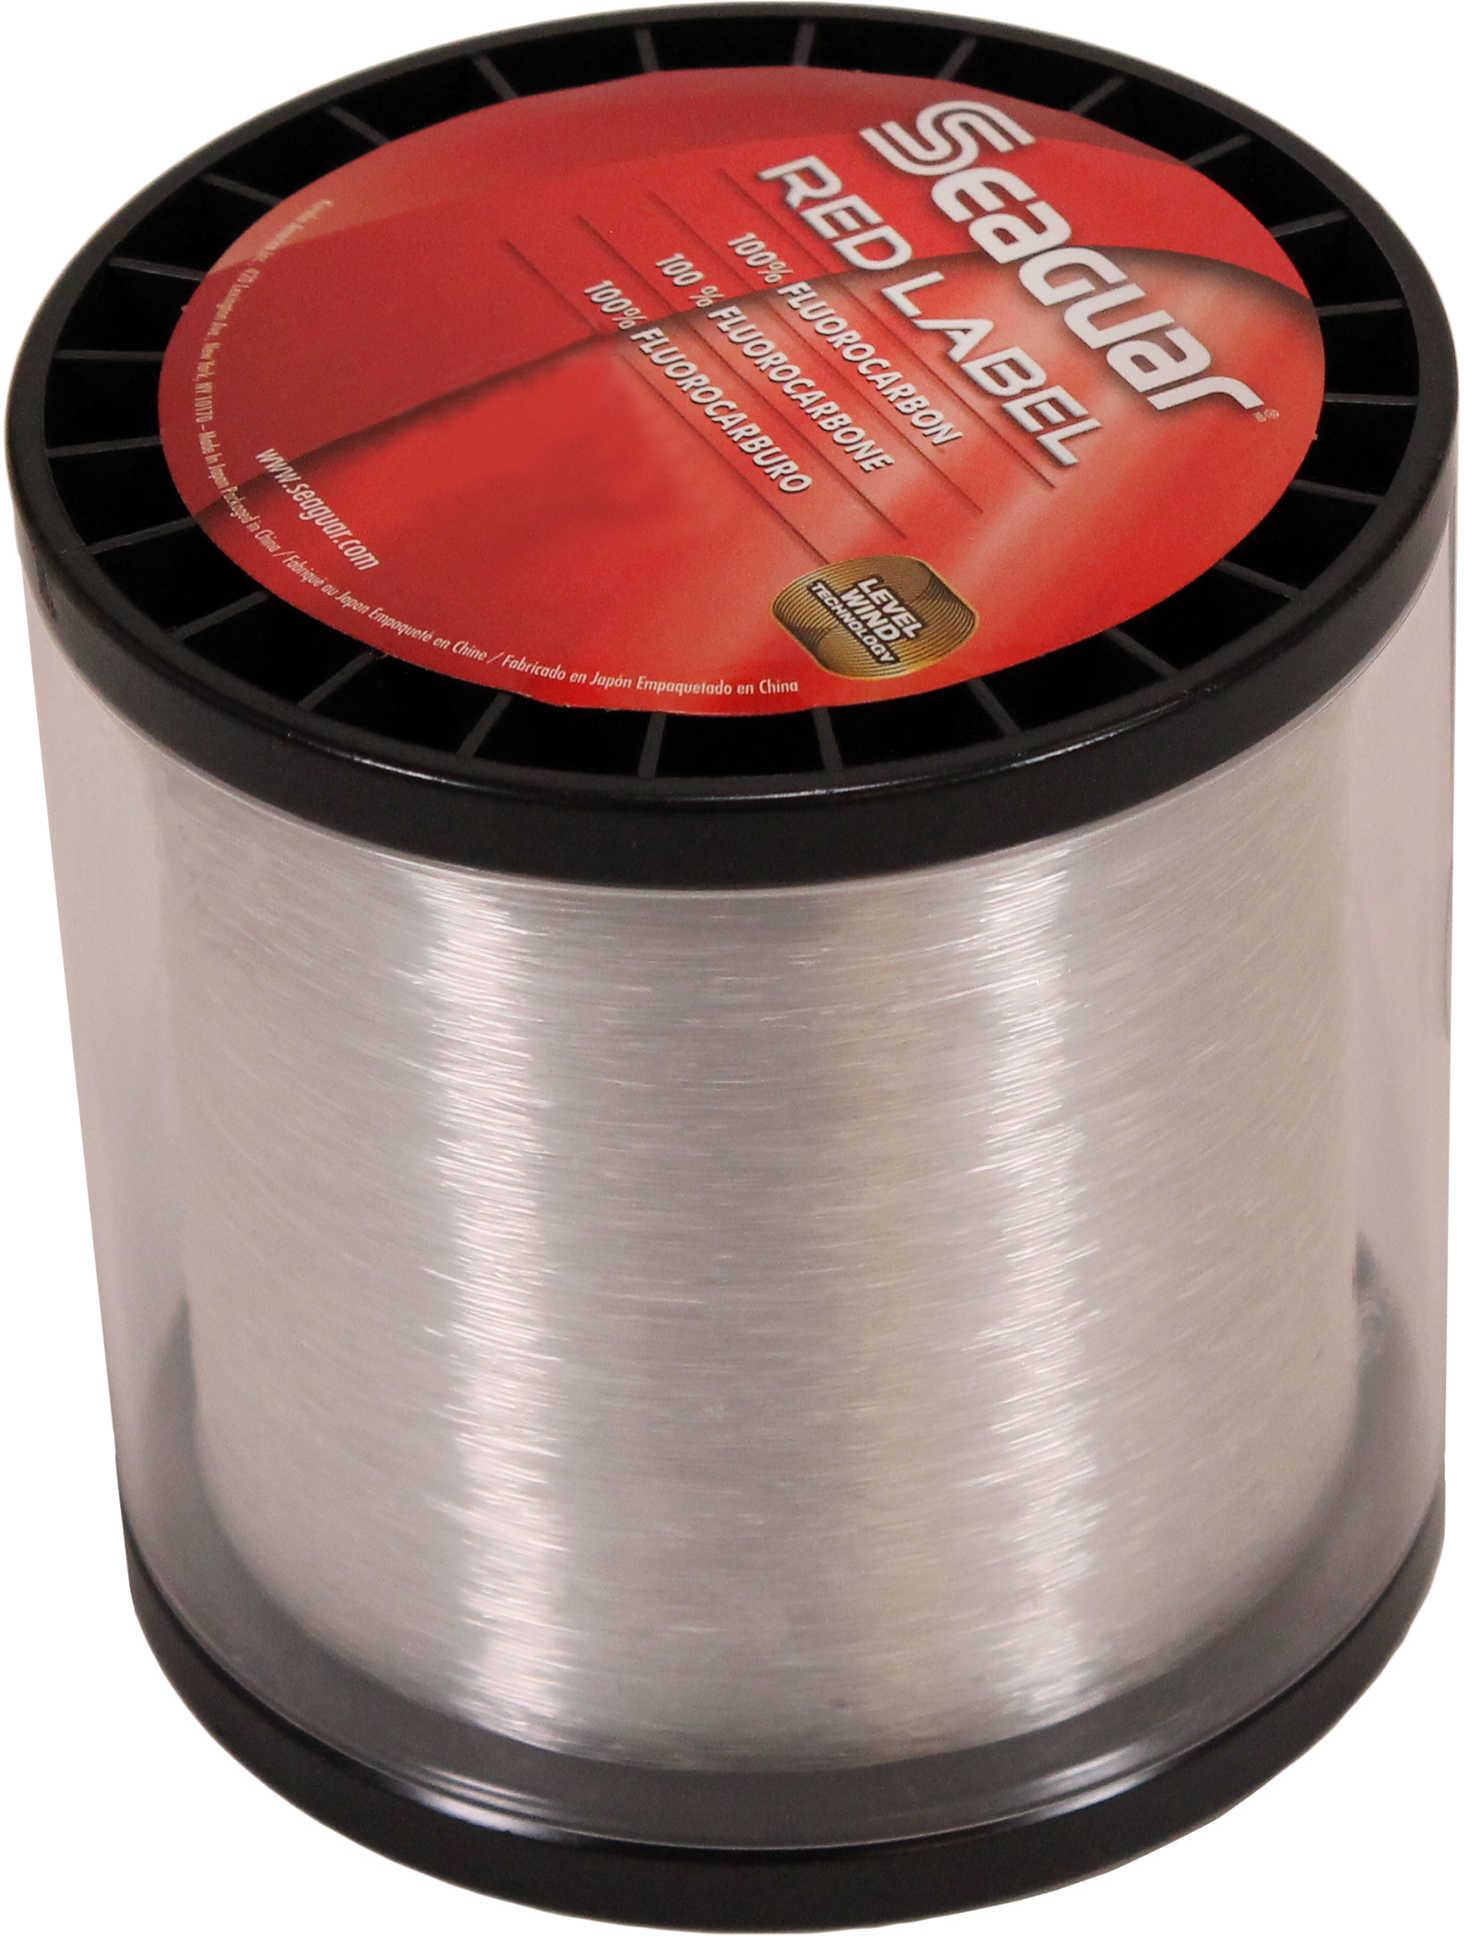 Seaguar / Kureha America Seaguar Red Label Fluorocarbon Clear 1000yds 10lb Fishing Line 10RM-1000